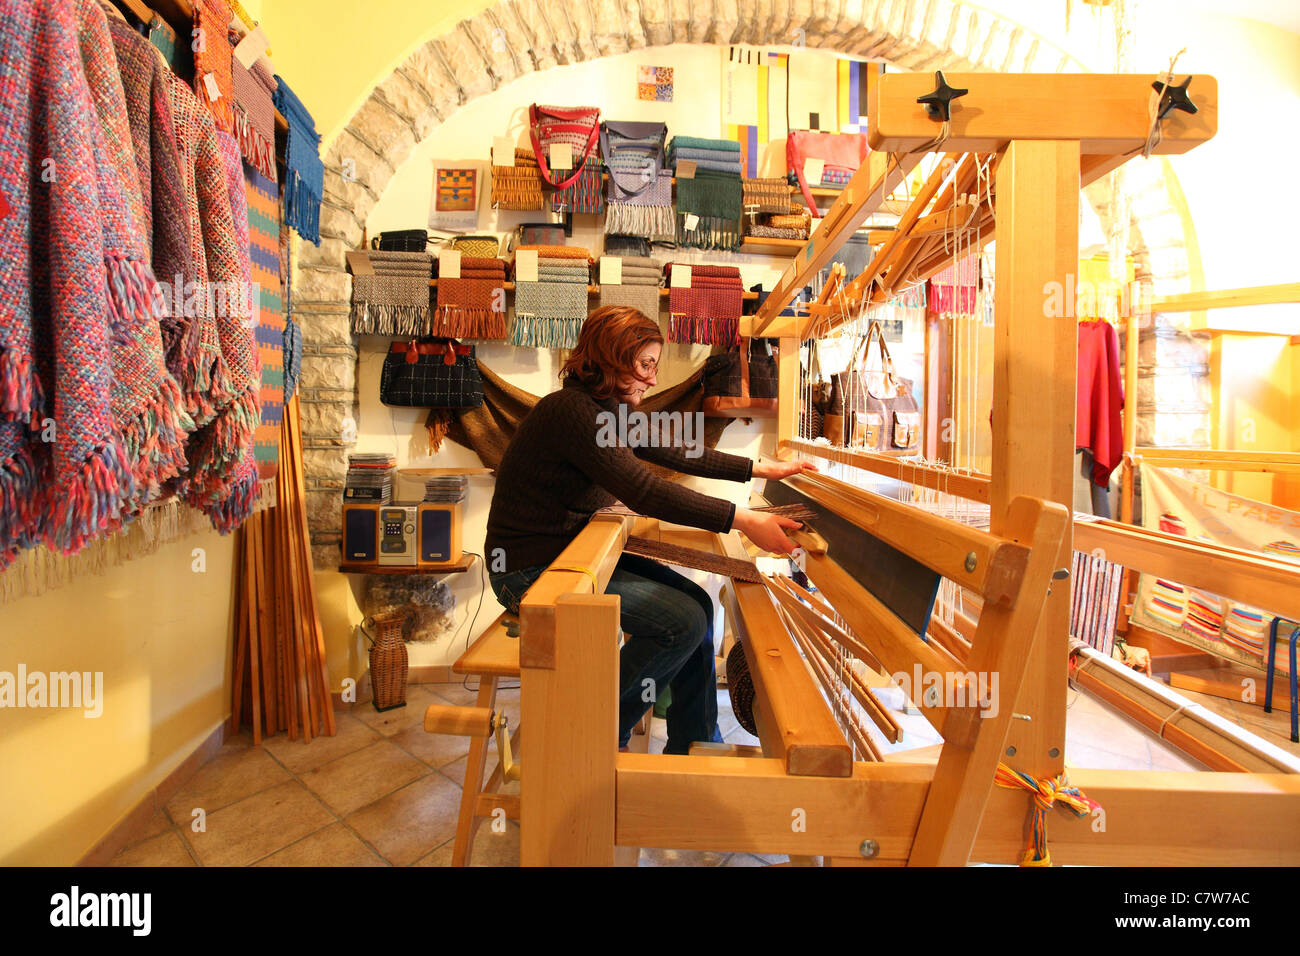 Italy, Campania, Bisaccia, textile handicrafts - Stock Image